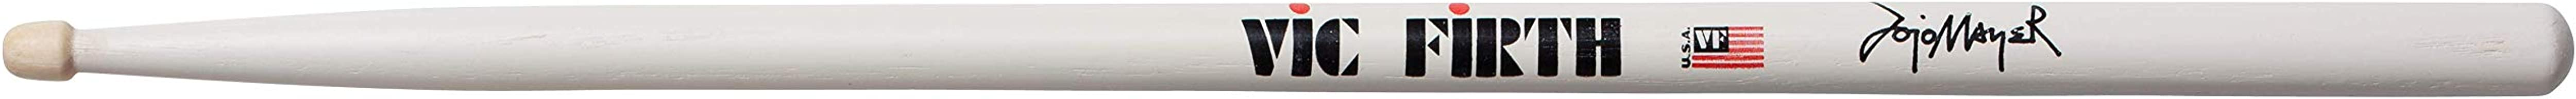 VIC FIRTH ドラムスティック JOJO MAYER MODEL VIC-SJM